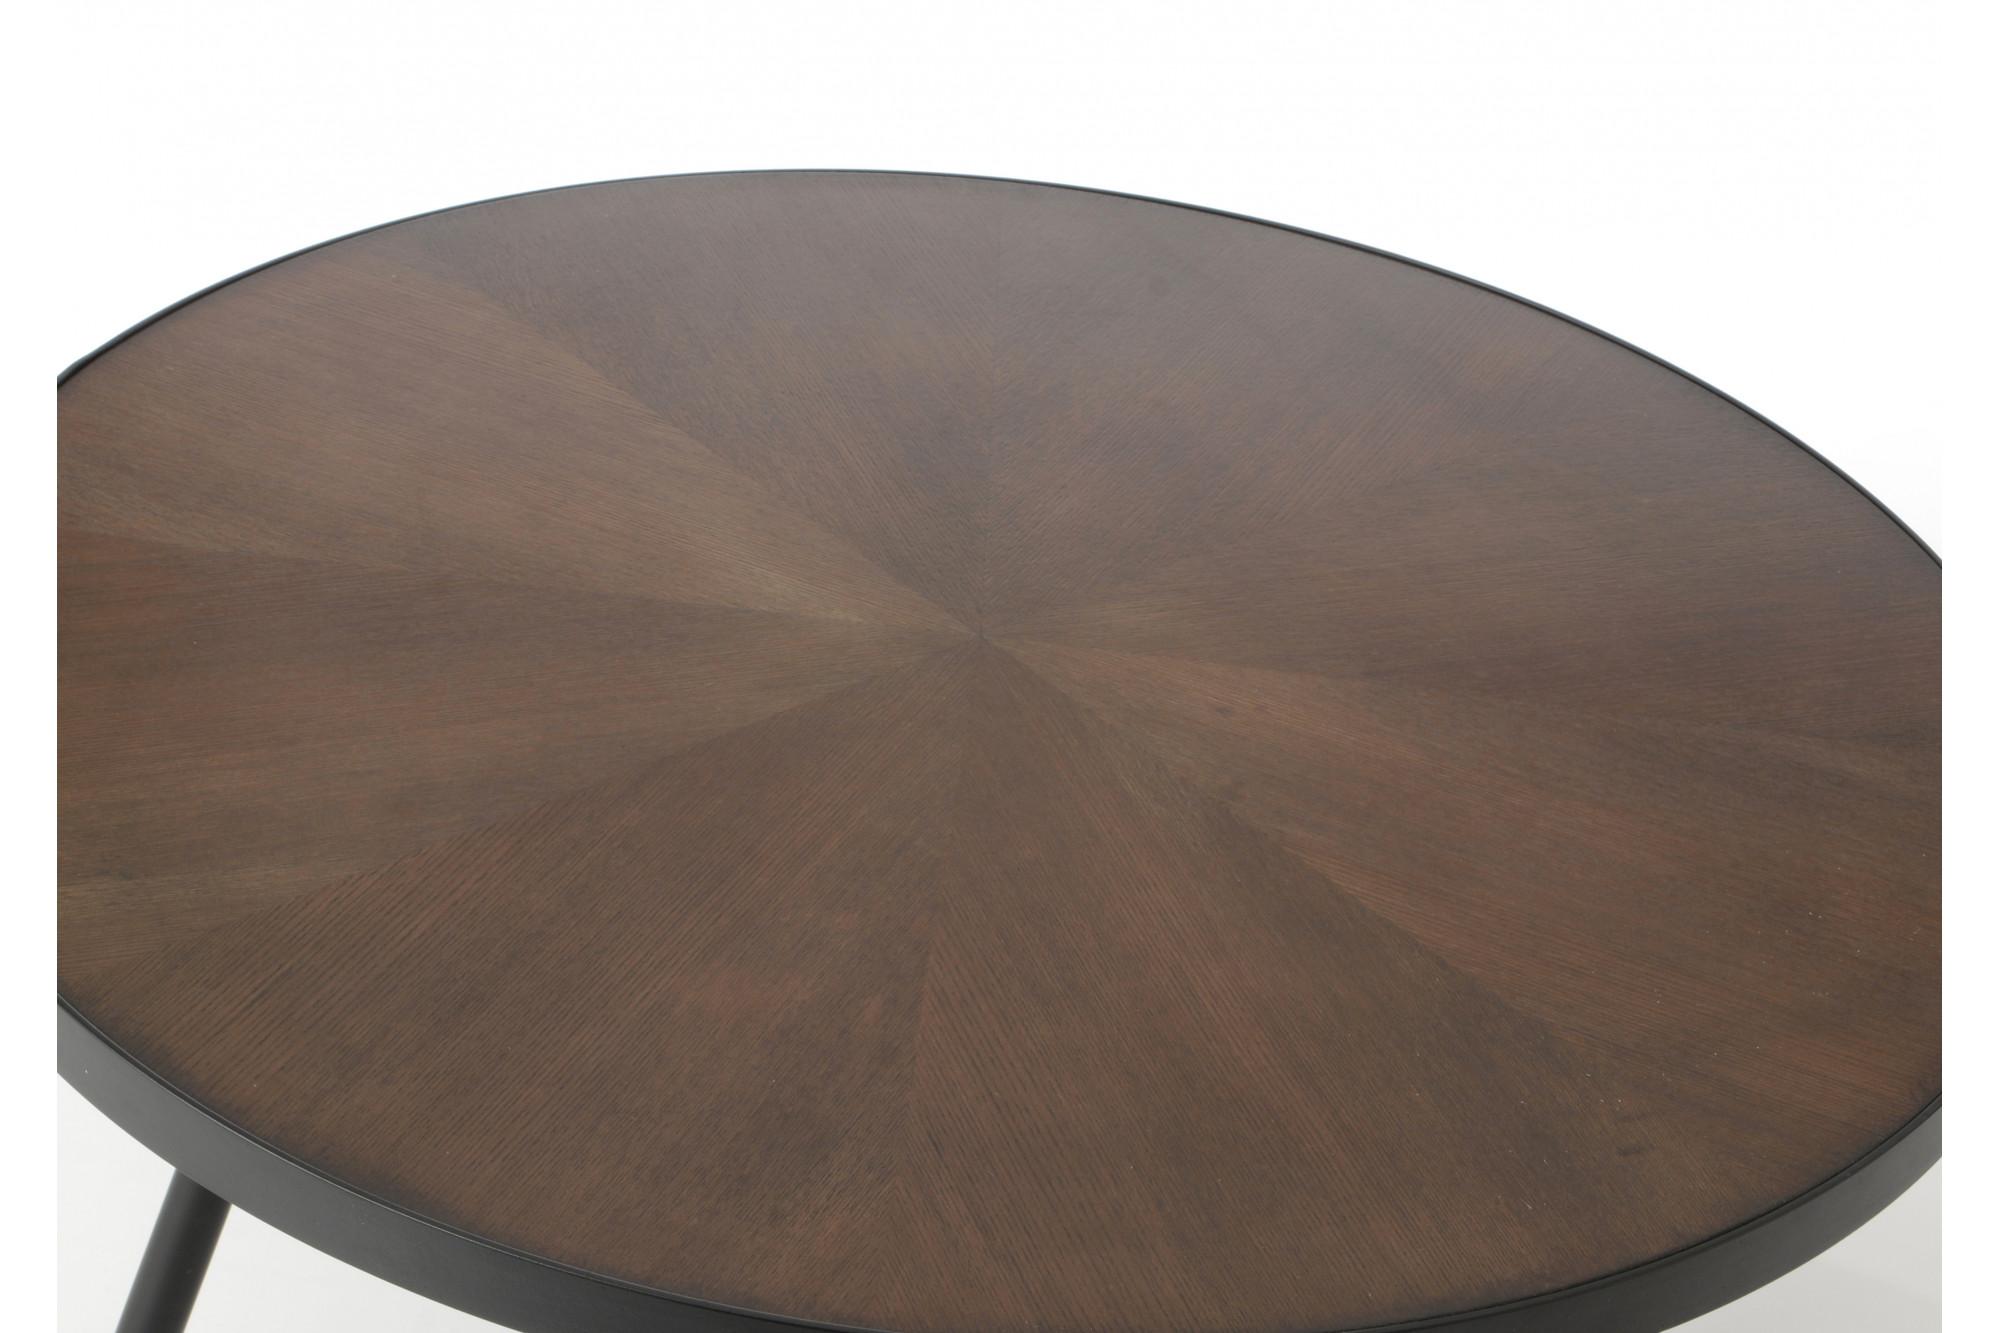 Table basse ronde grand mod le hoffman hellin - Modele table basse ...